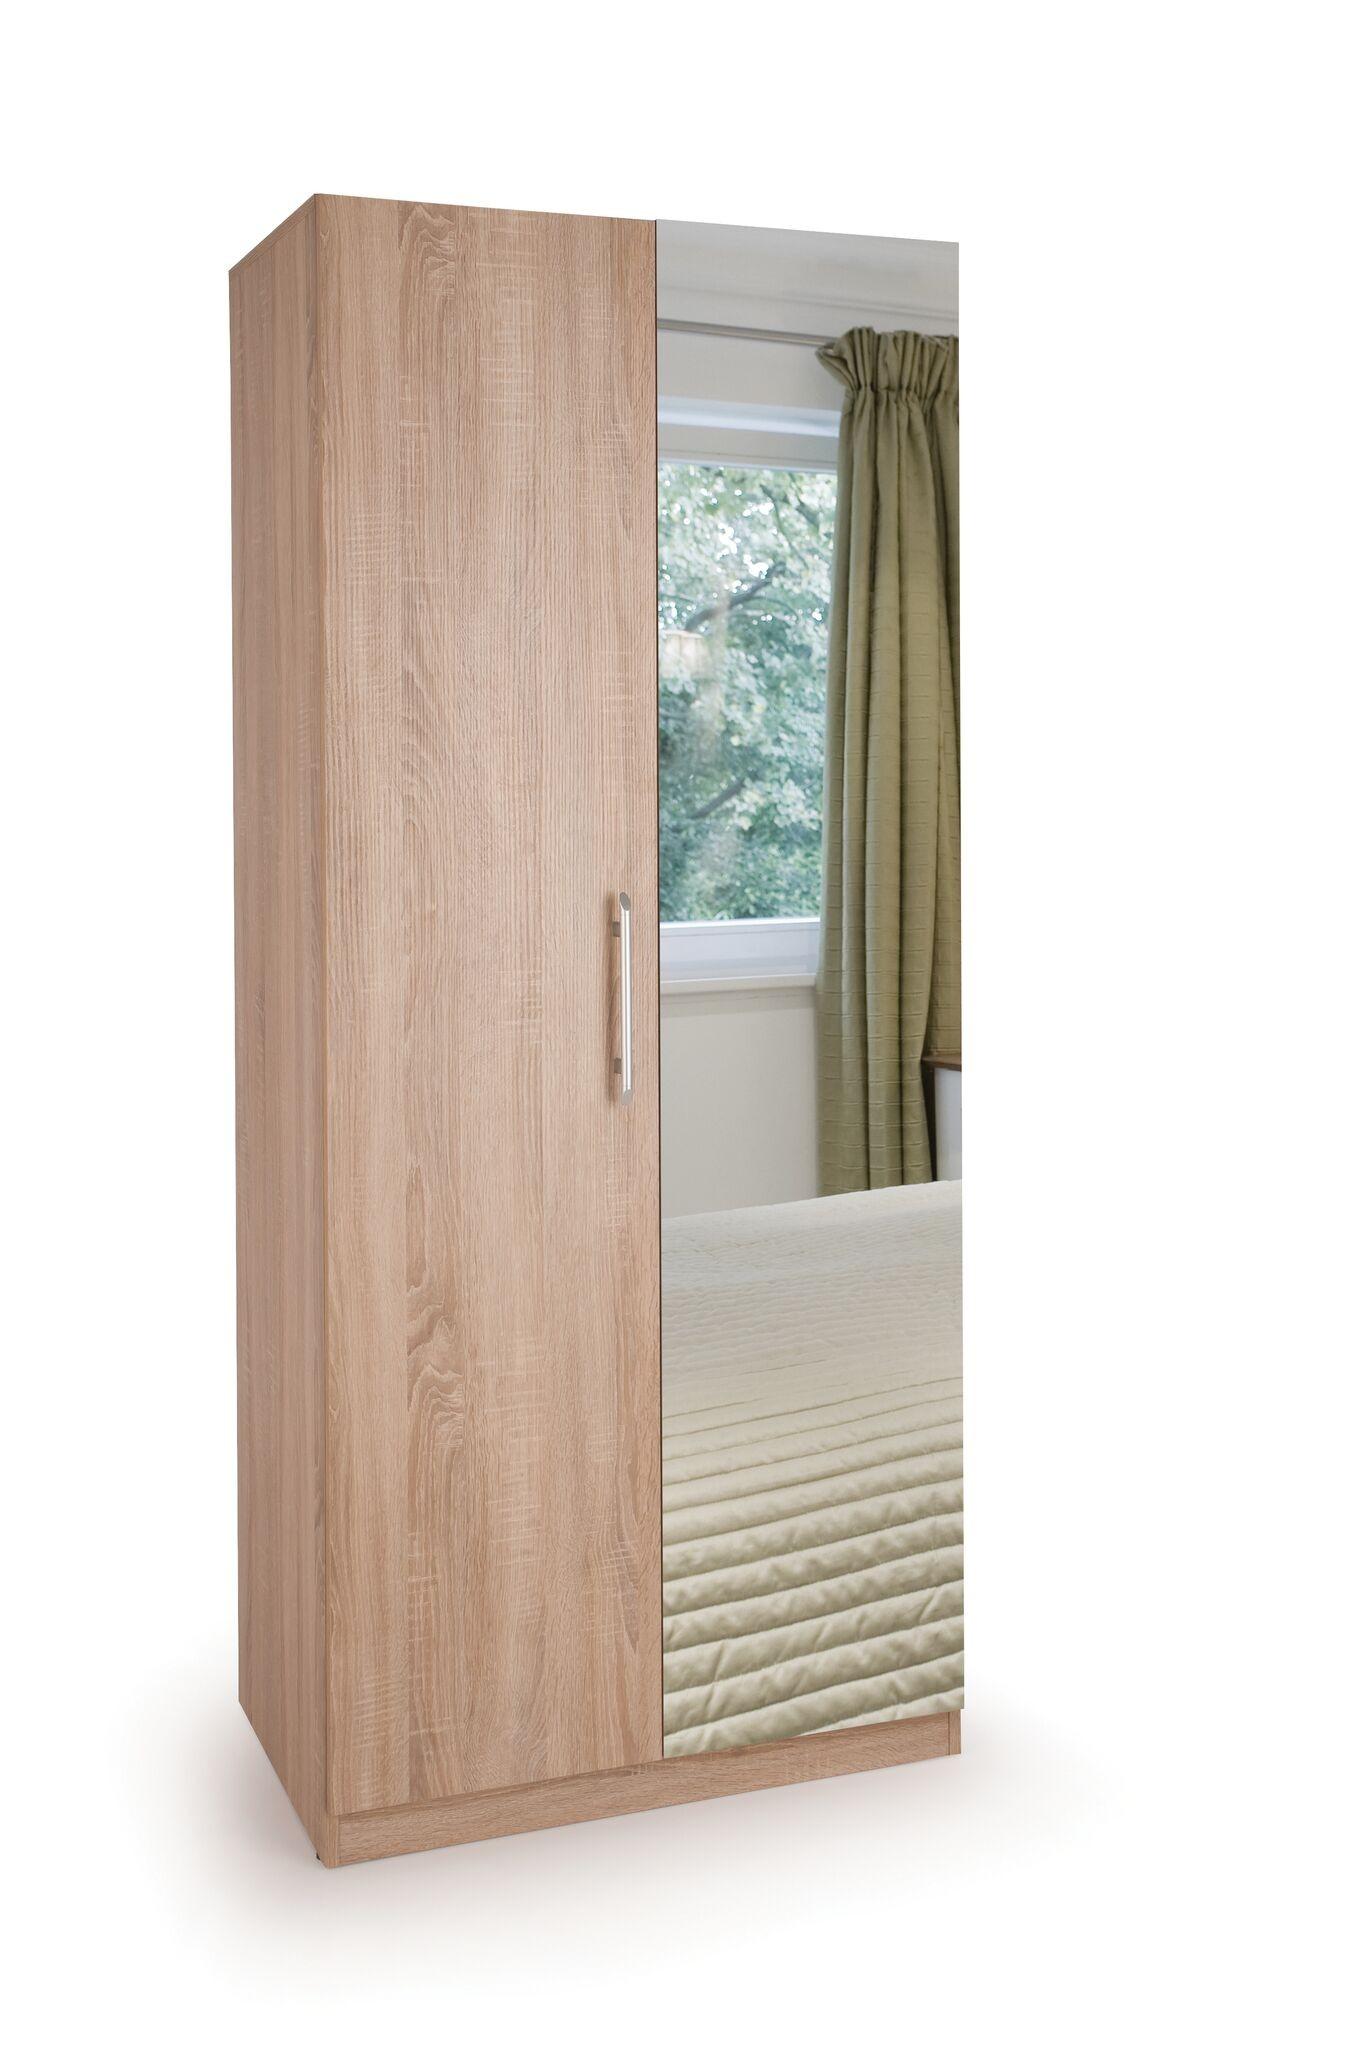 Connect Holborn 2 Door Wardrobe with Mirror